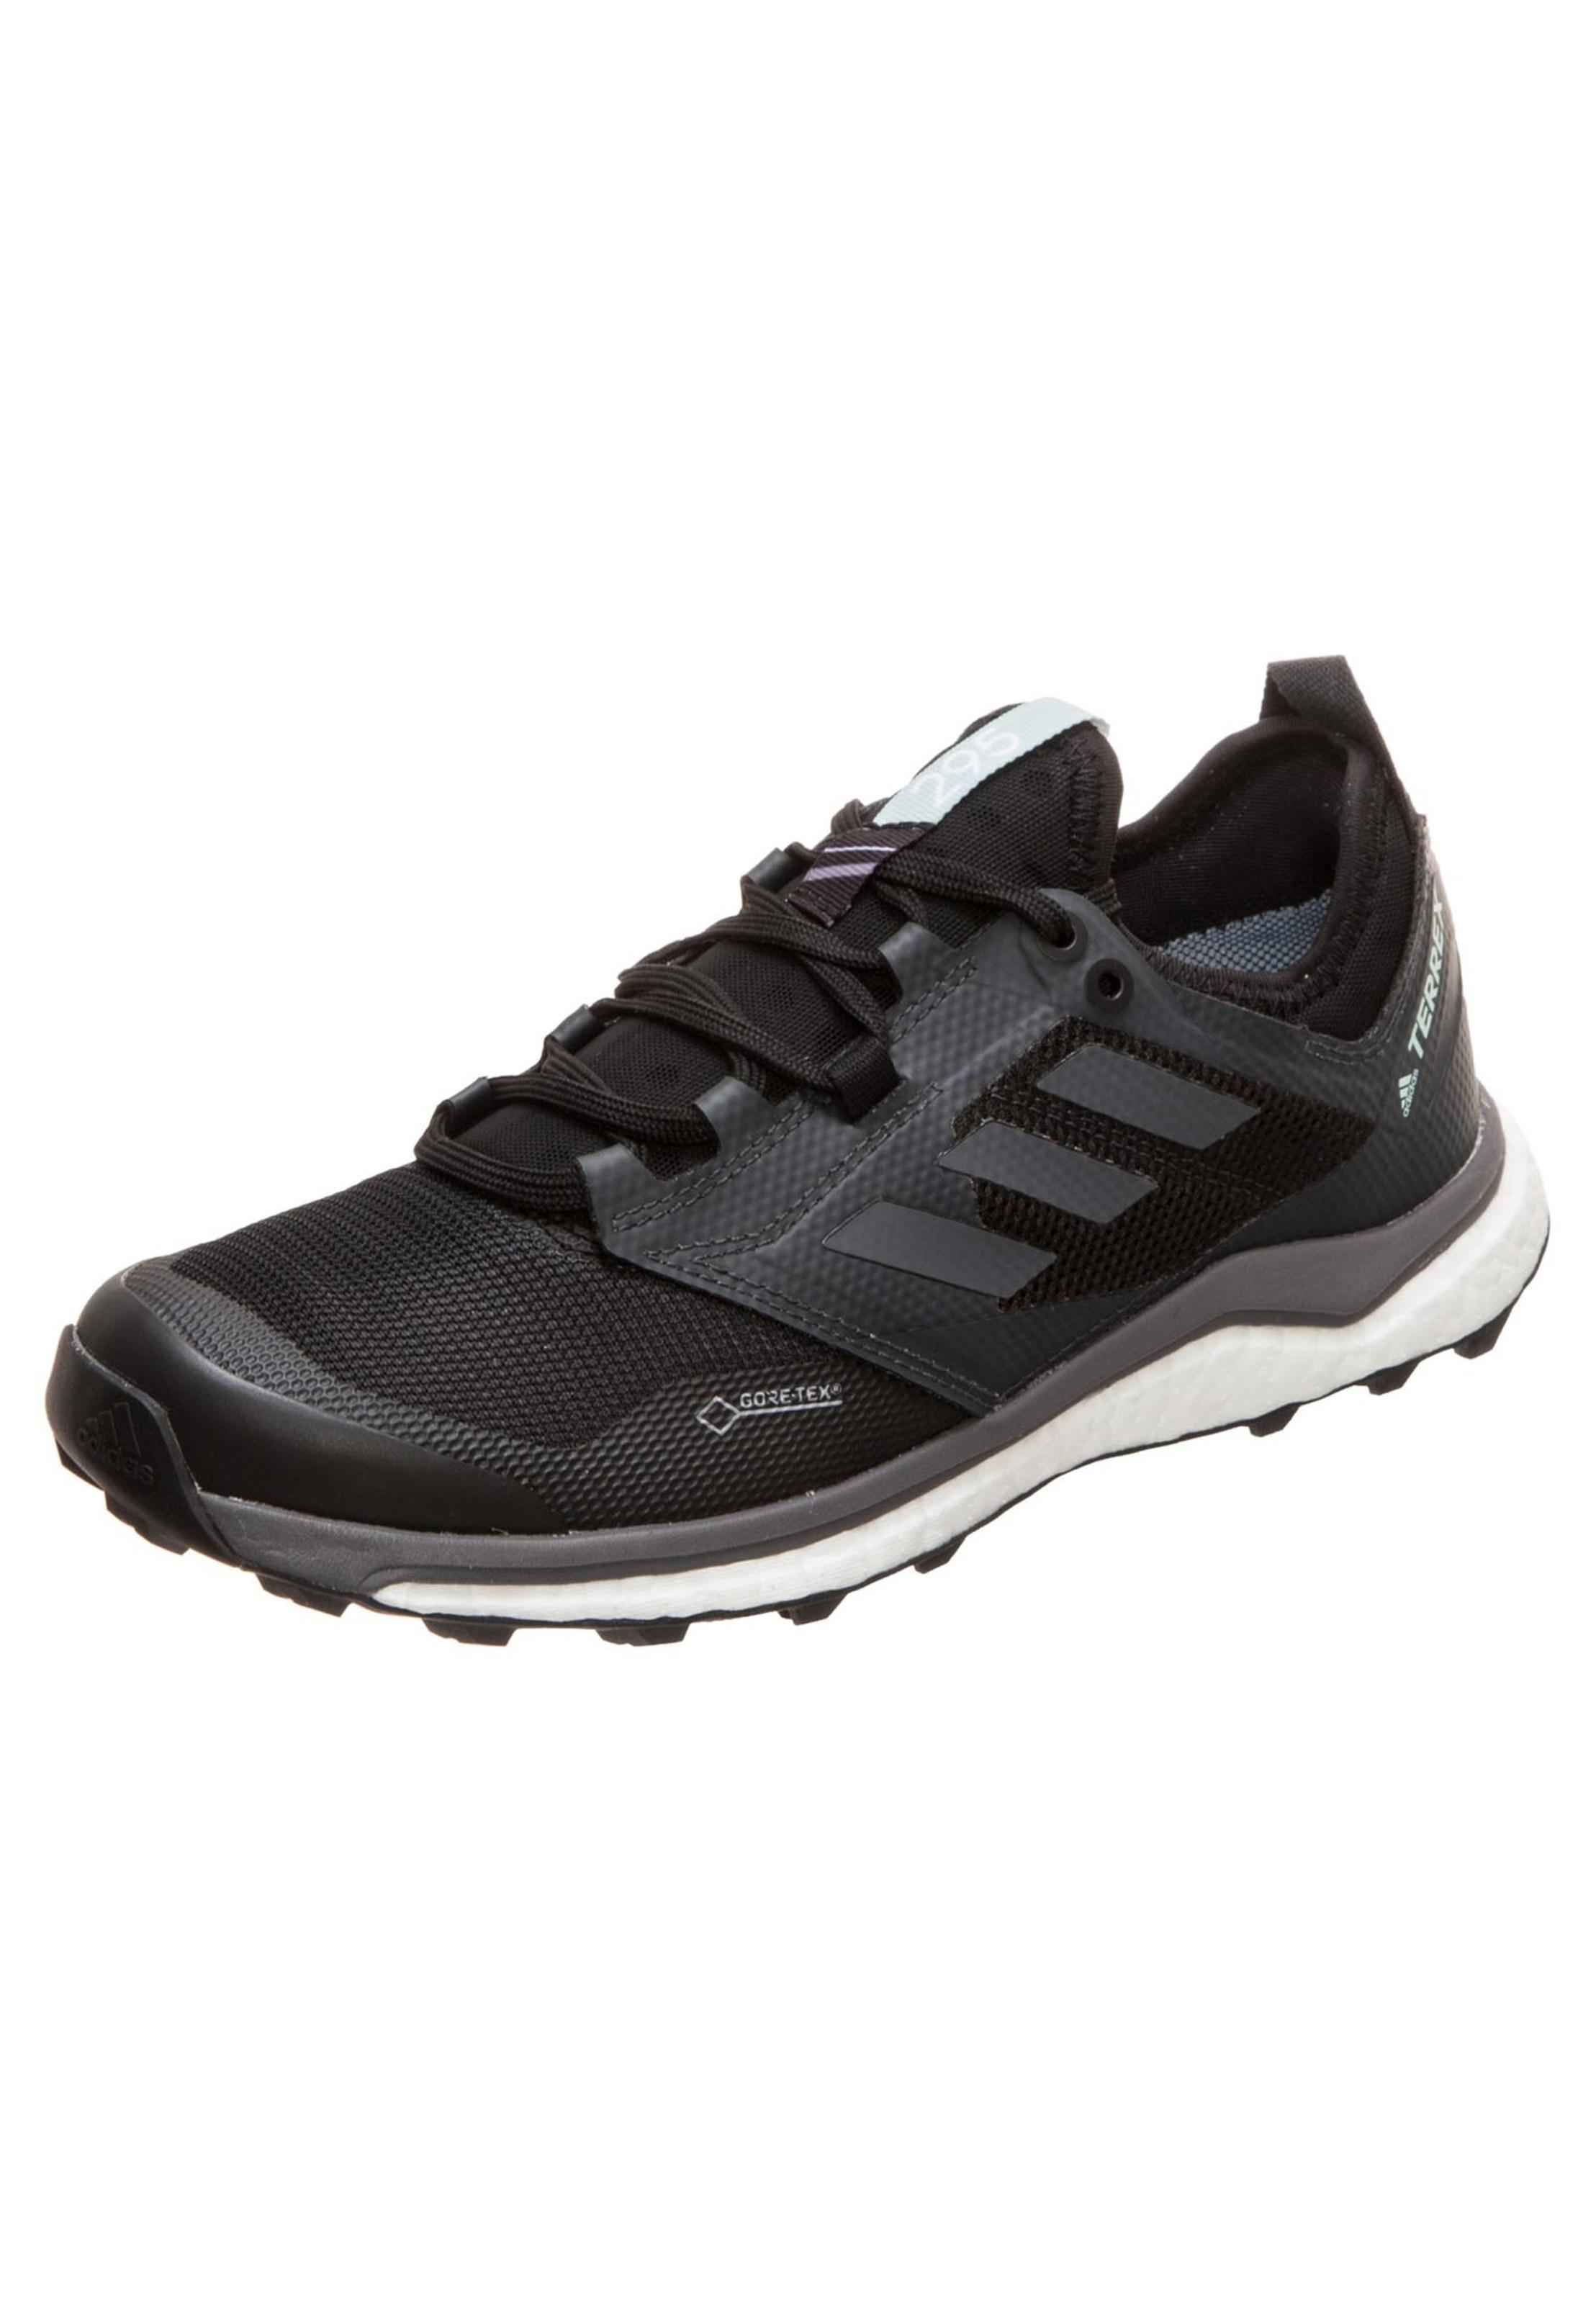 417e9d457b ADIDAS PERFORMANCE Běžecká obuv  Terrex Agravic XT GTX Trail   černá ...